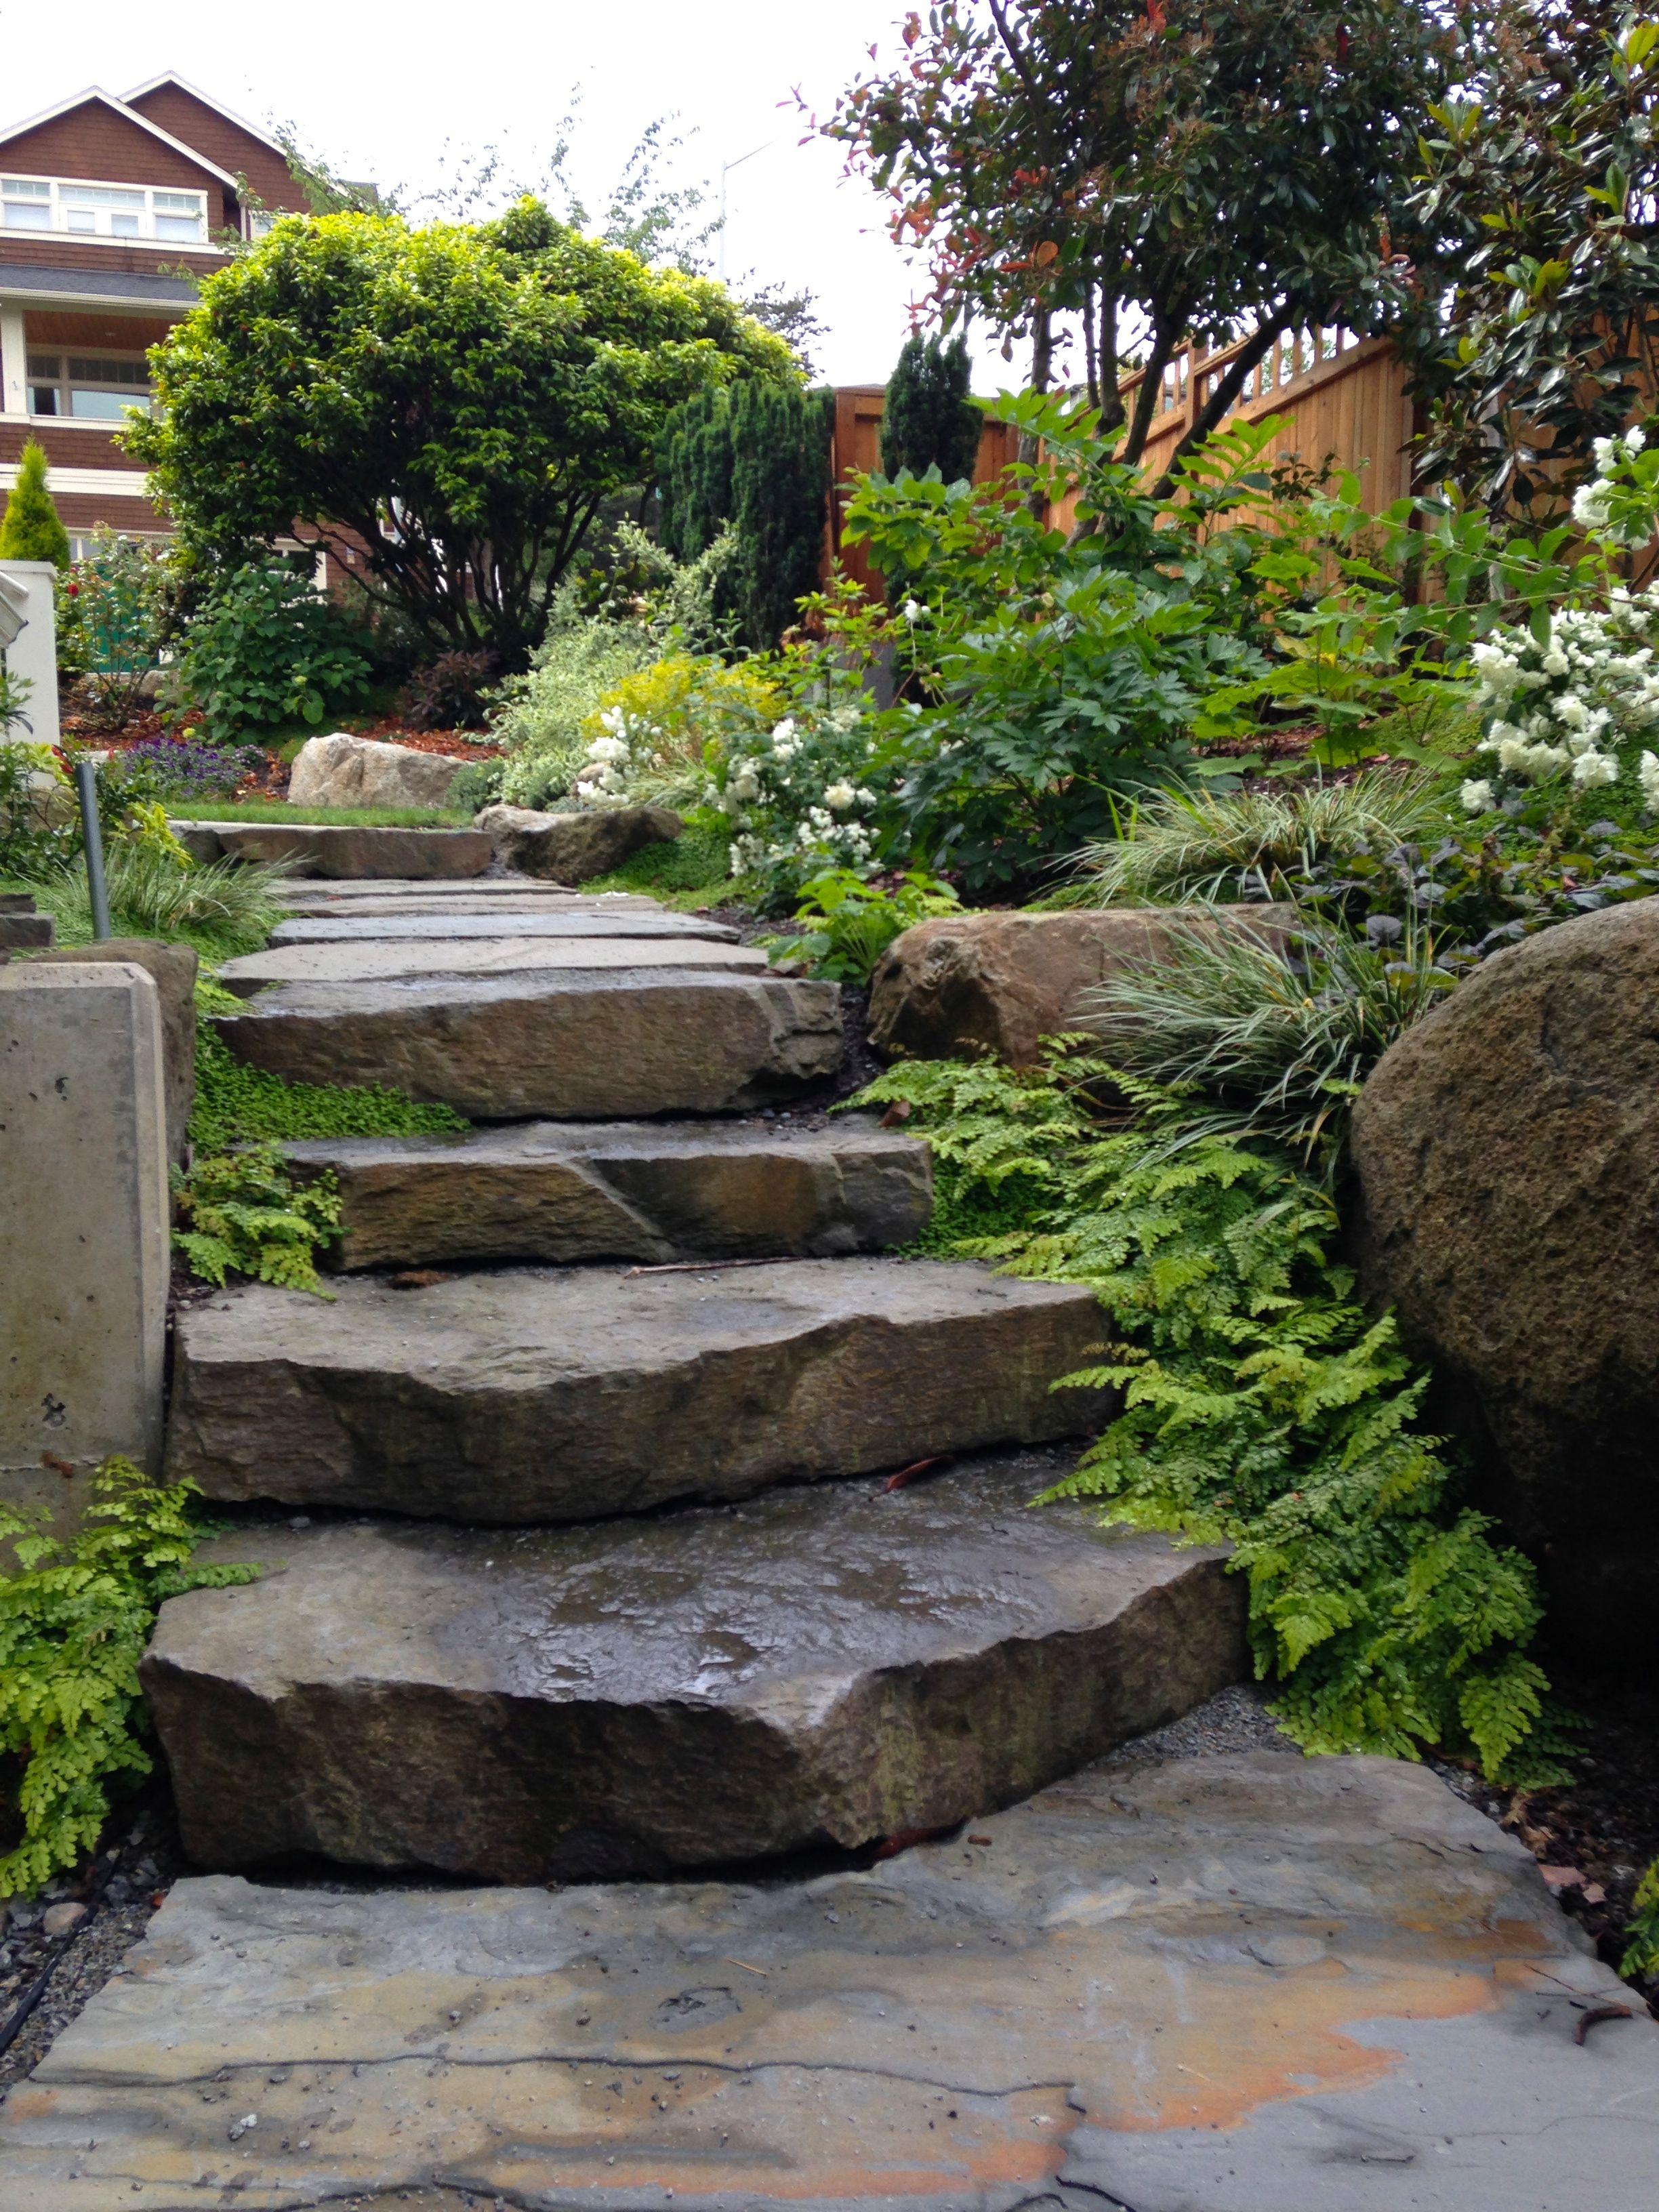 Stone Steps Leading From Front To Back Yards Gretchen Bauer Design Sloped Garden Stone Walls Garden Landscape Design